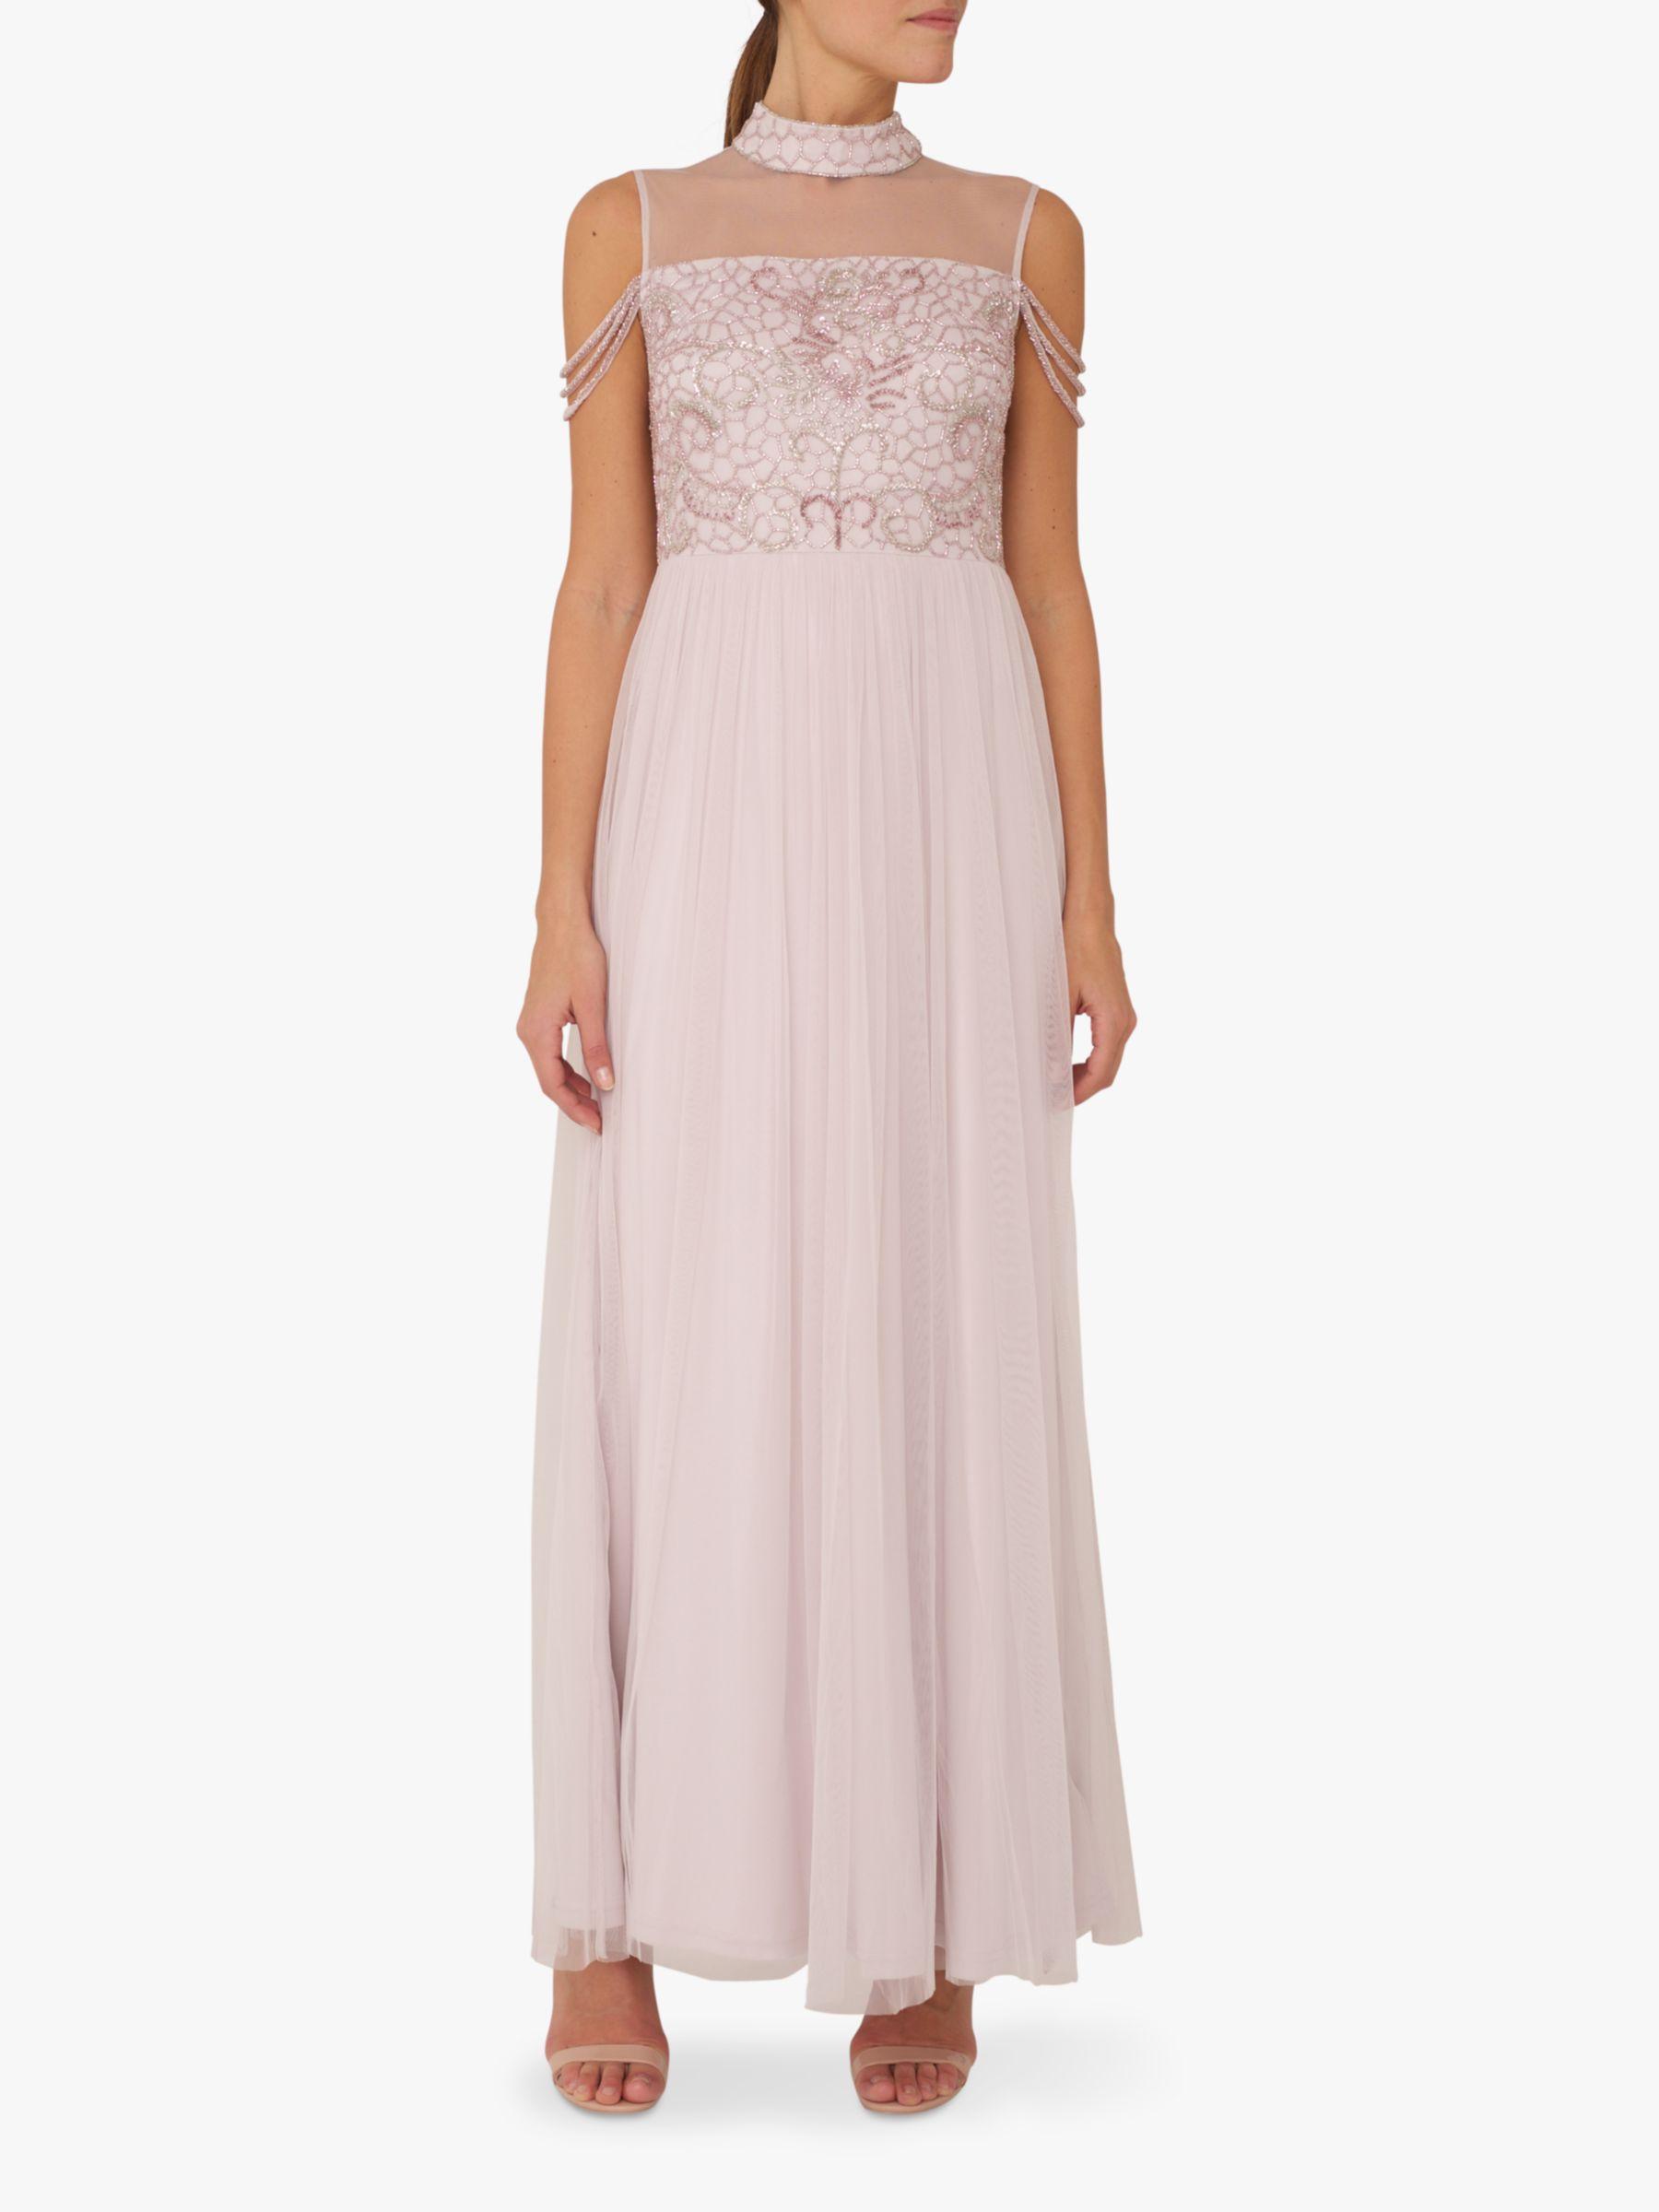 RAISHMA Raishma Paisley Embellished Dress, Light Lilac